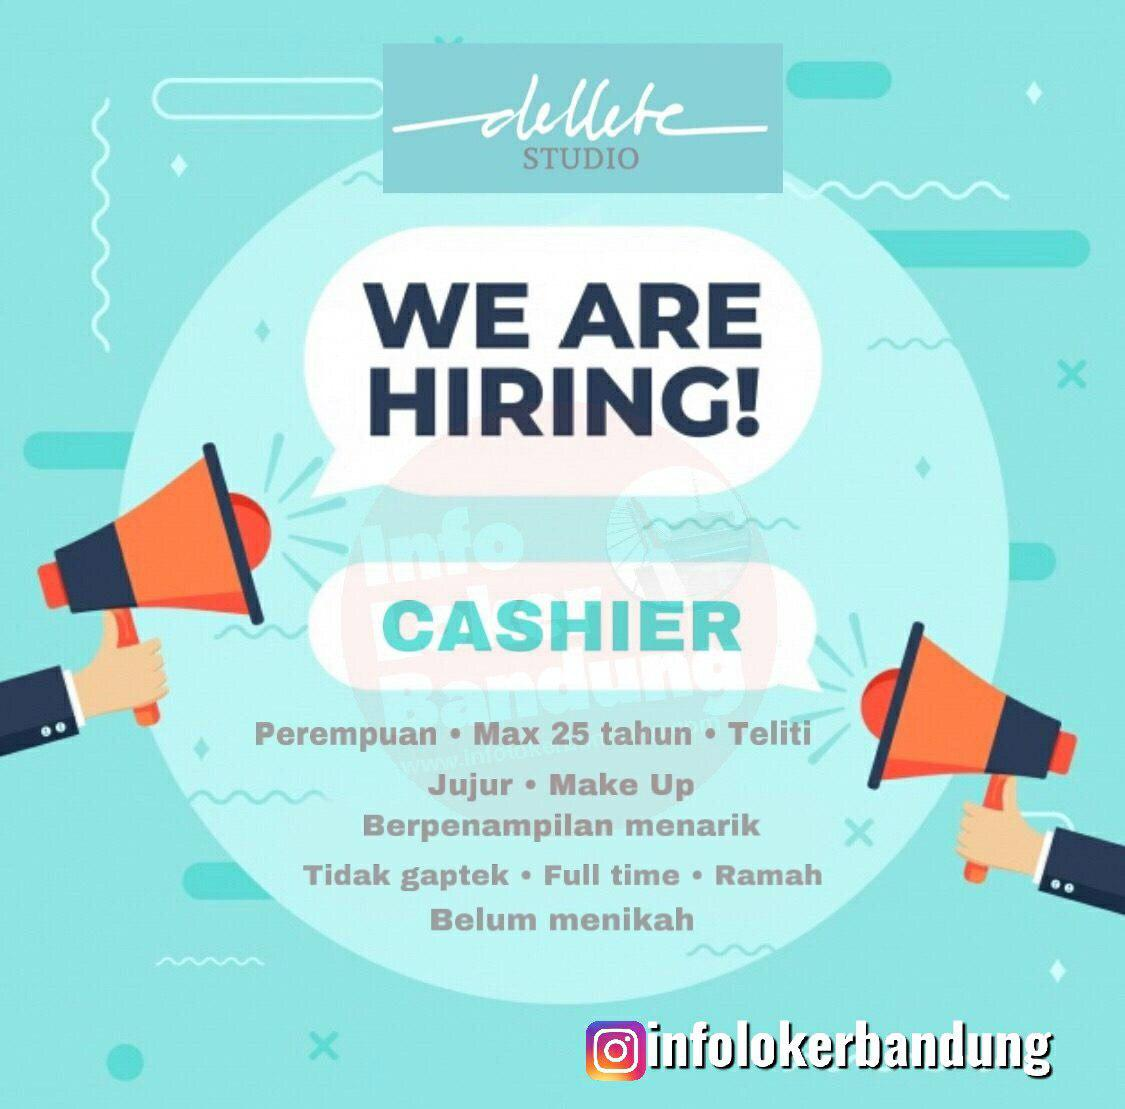 Lowongan Kerja Cashier Dellete Studio Bandung April 2019